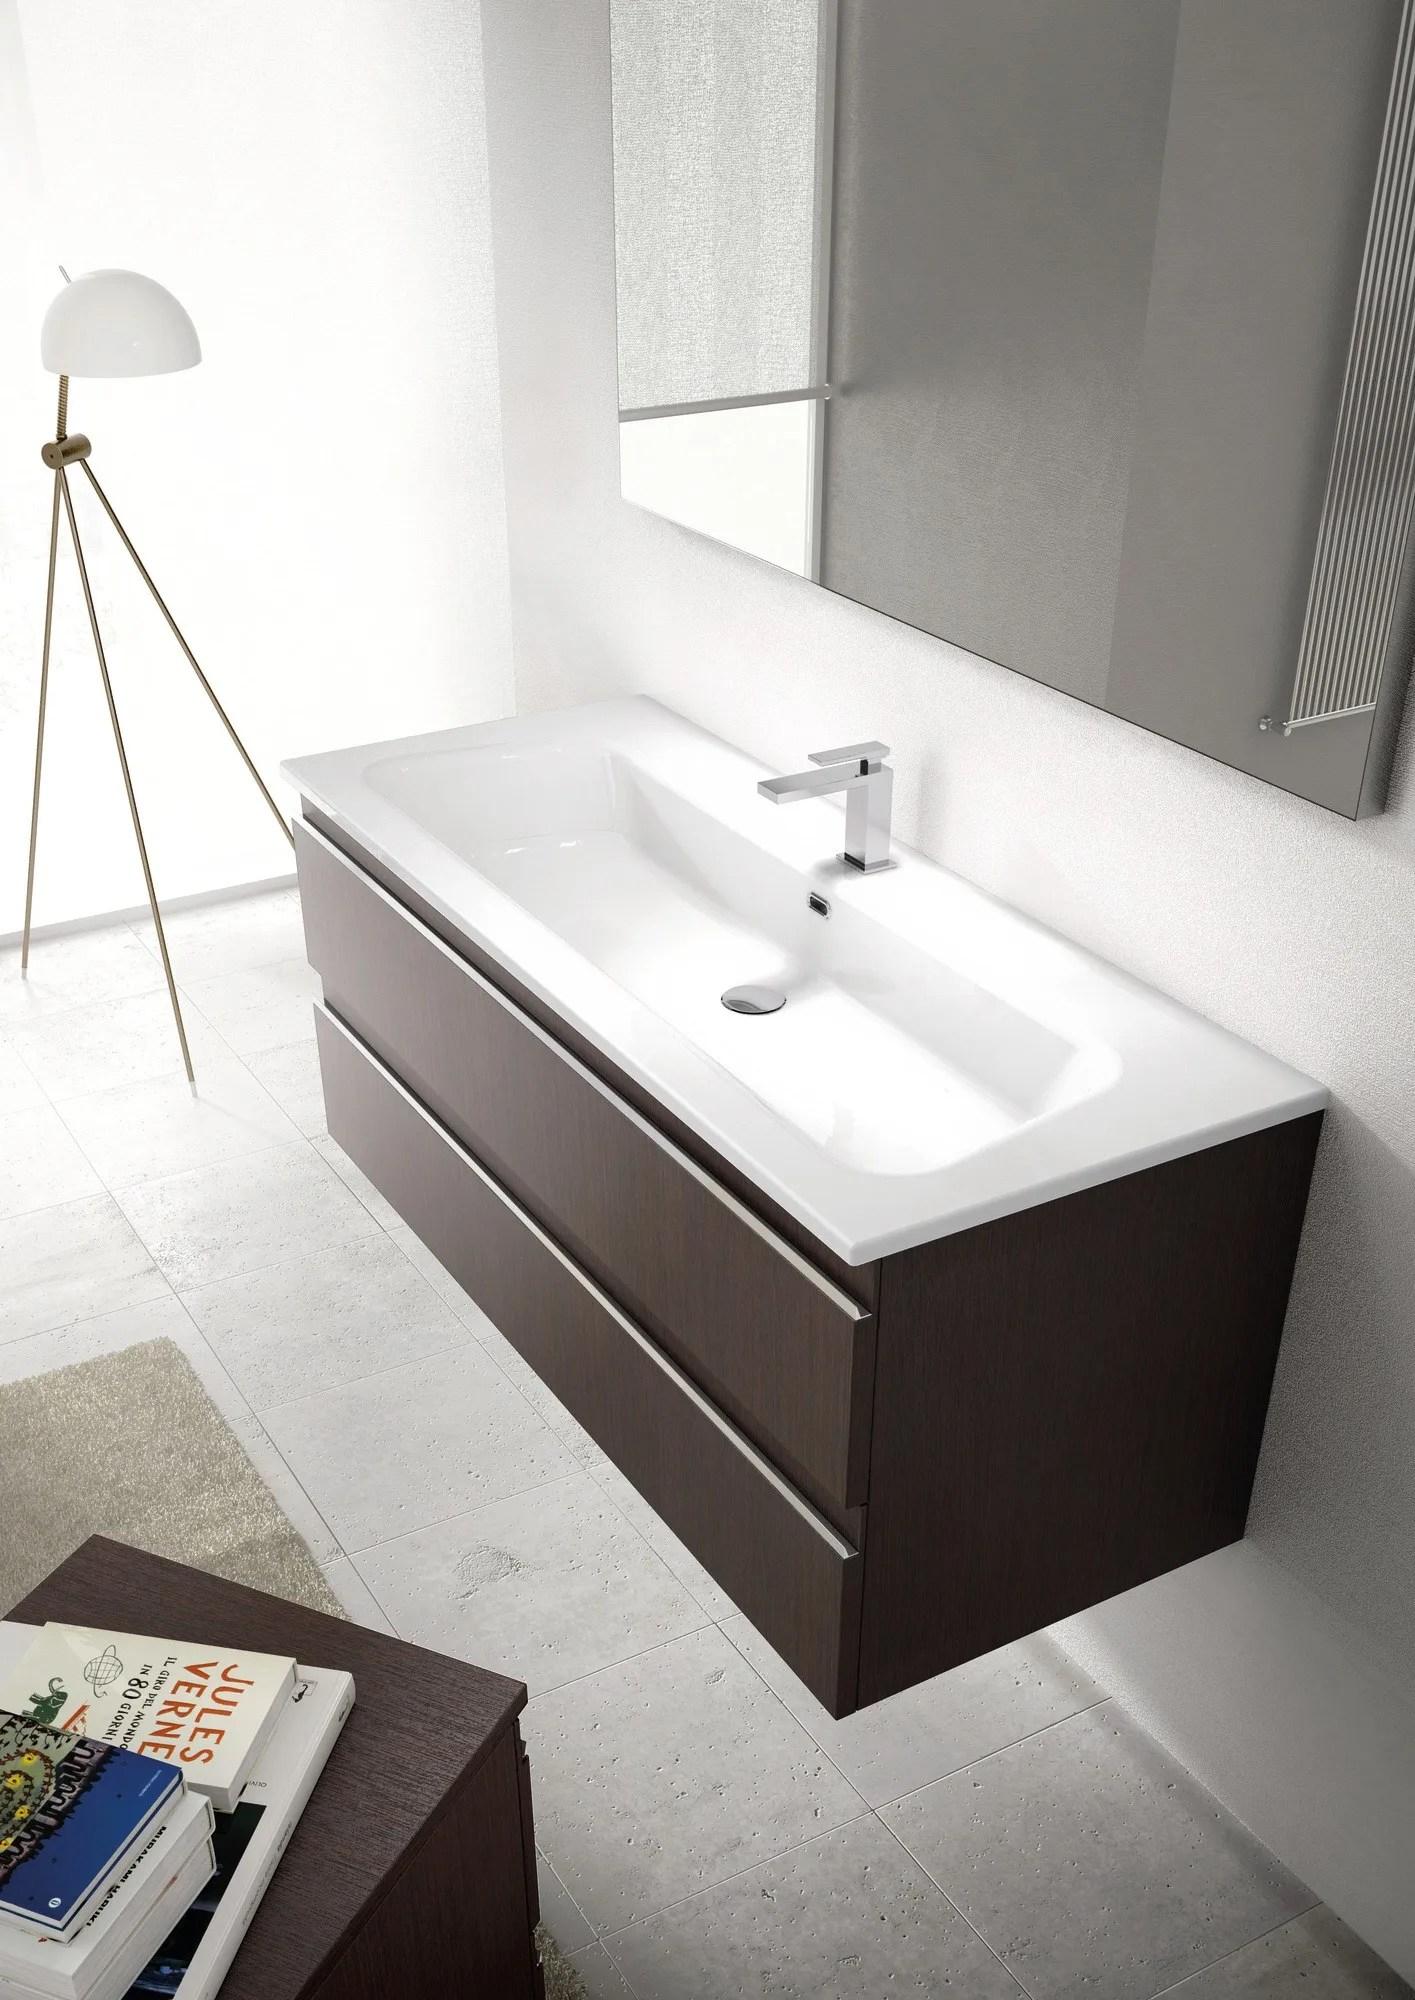 Arredo bagno completo MISTRAL COMP 06 by IdeaGroup